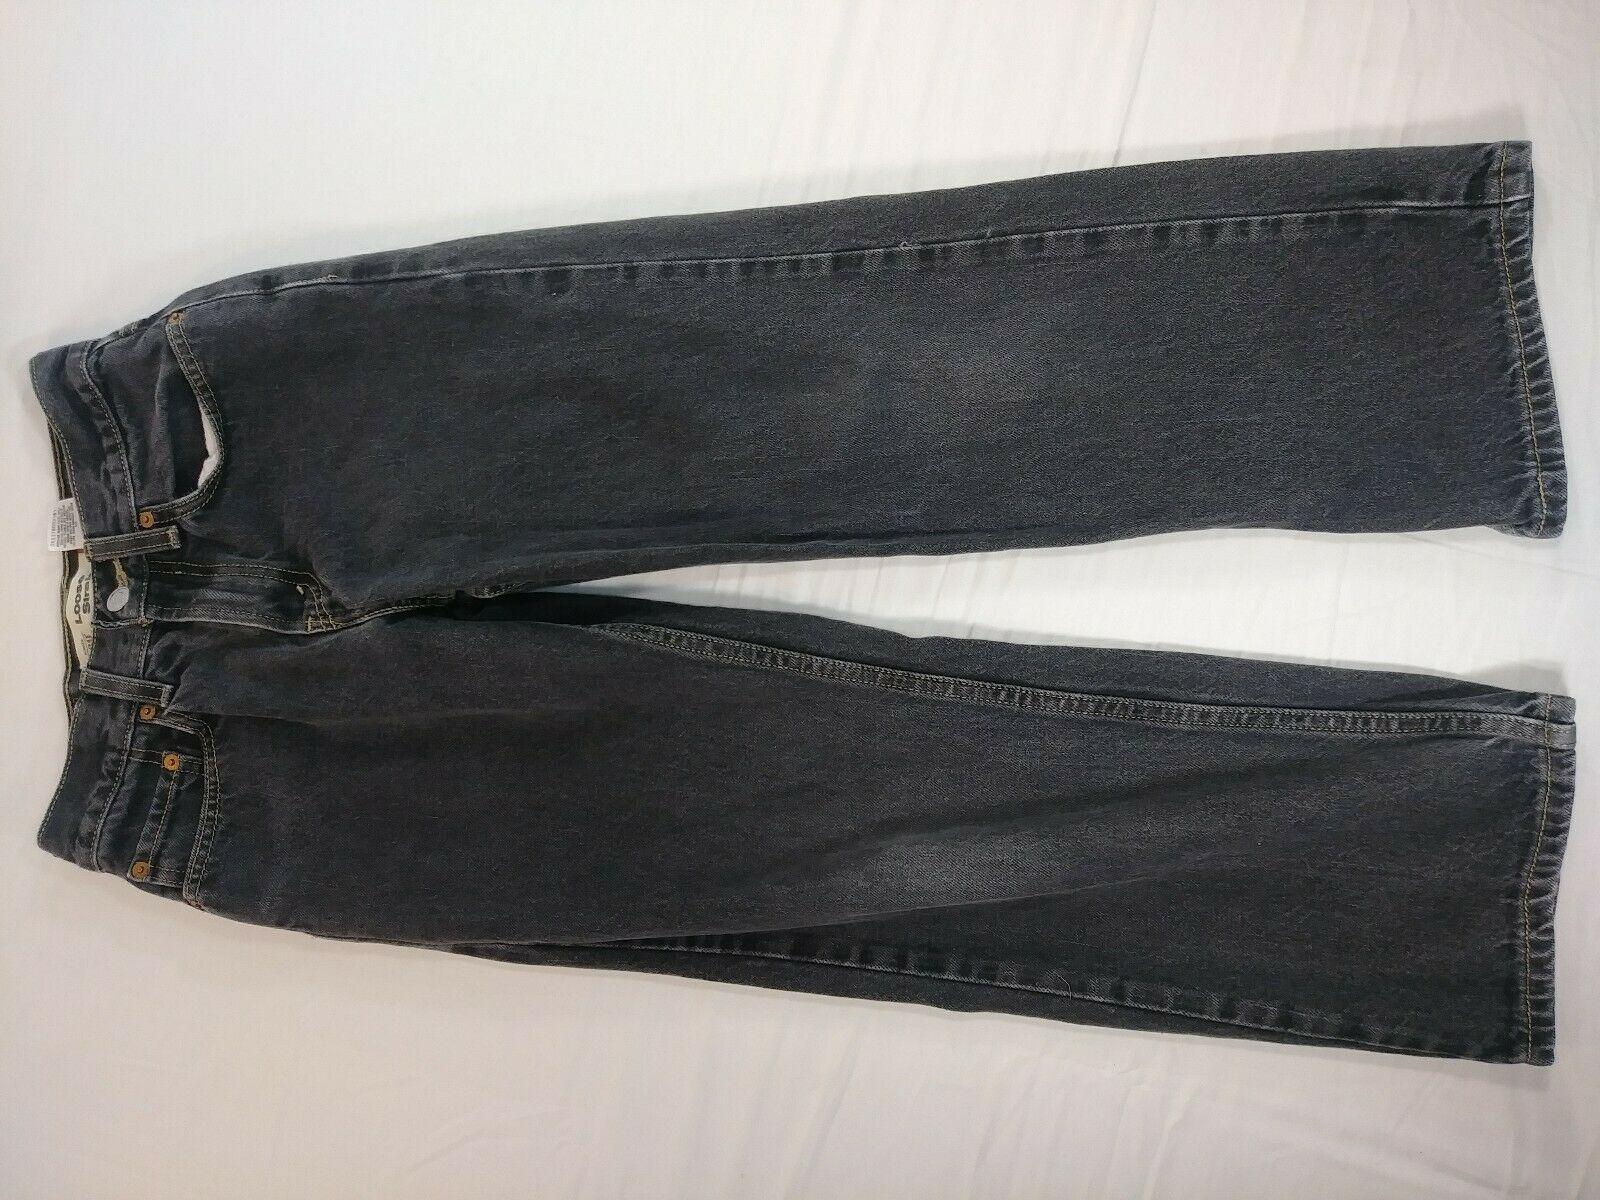 Boys Youth Levi's 569 Loose Straight Jeans Size 12 Black Denim (#7) image 4